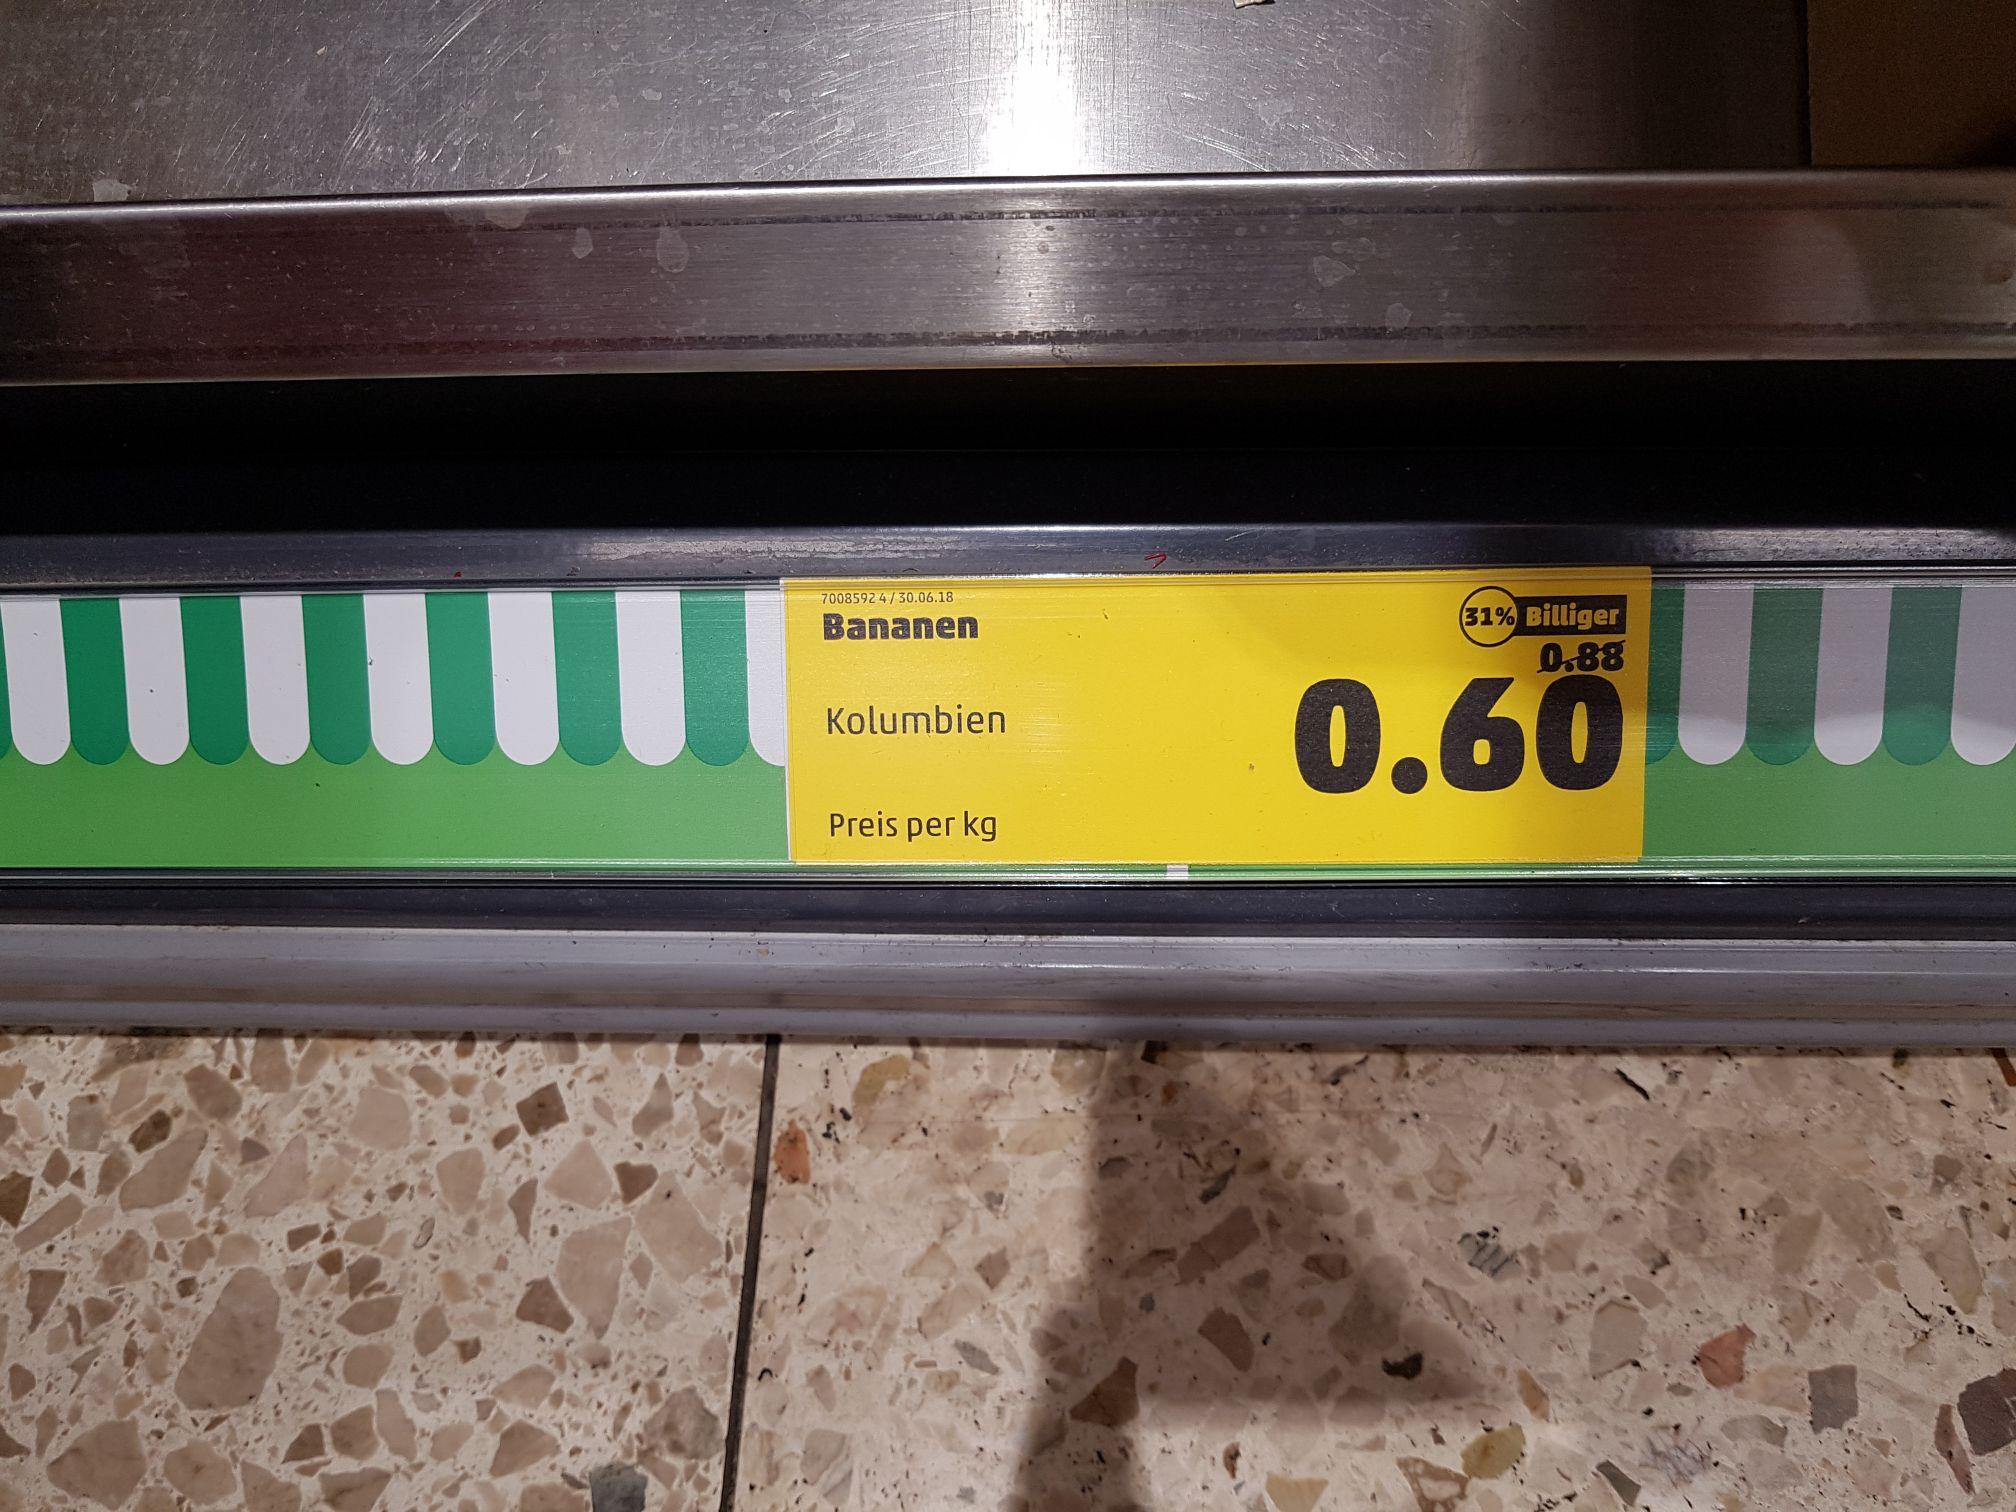 [Lokal - Penny Heidelberg Rohrbach] Bananen für 0,60€